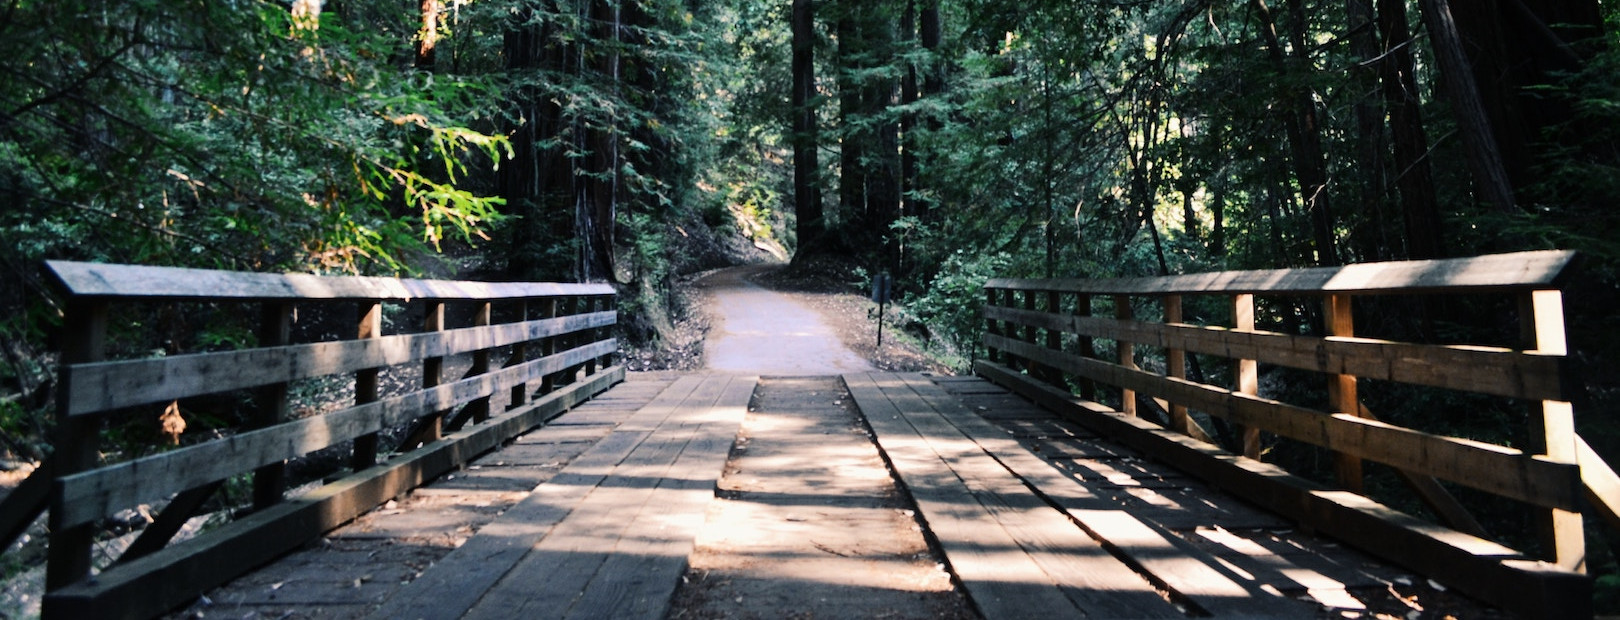 First Responders' Bridge